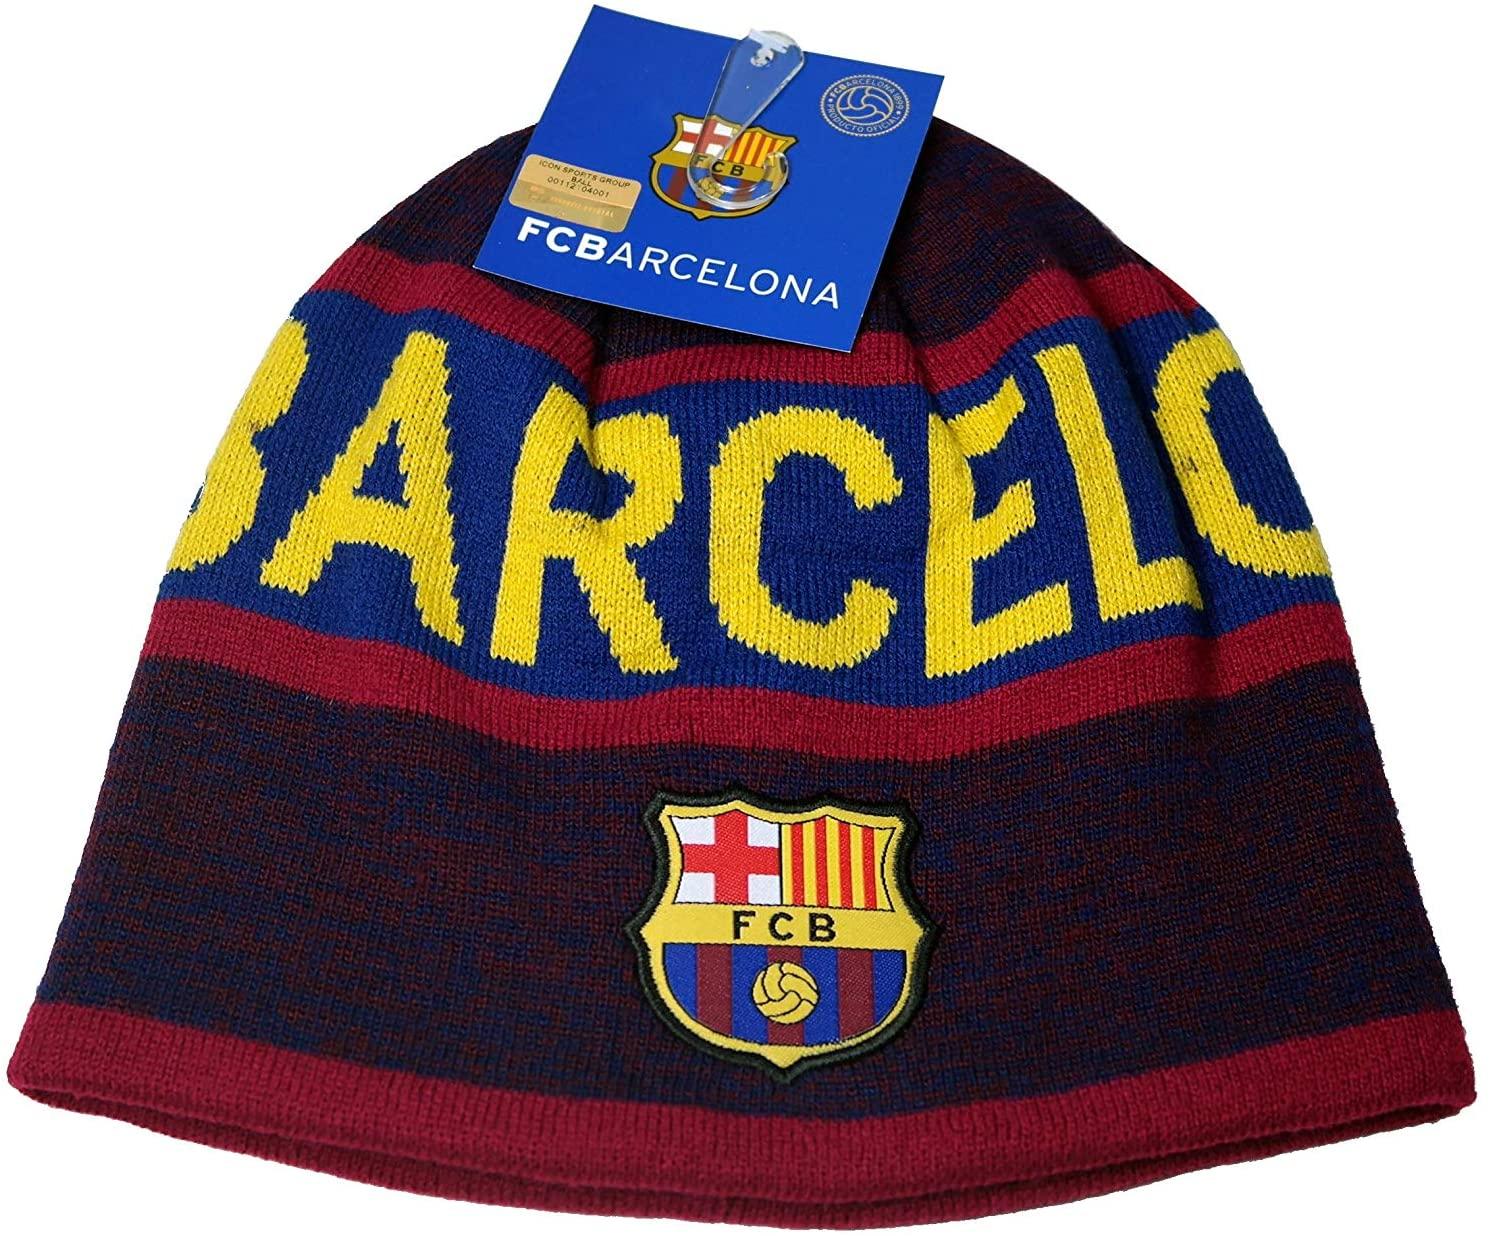 FC Barcelona Authentic Official Football Men's Soccer Beanie